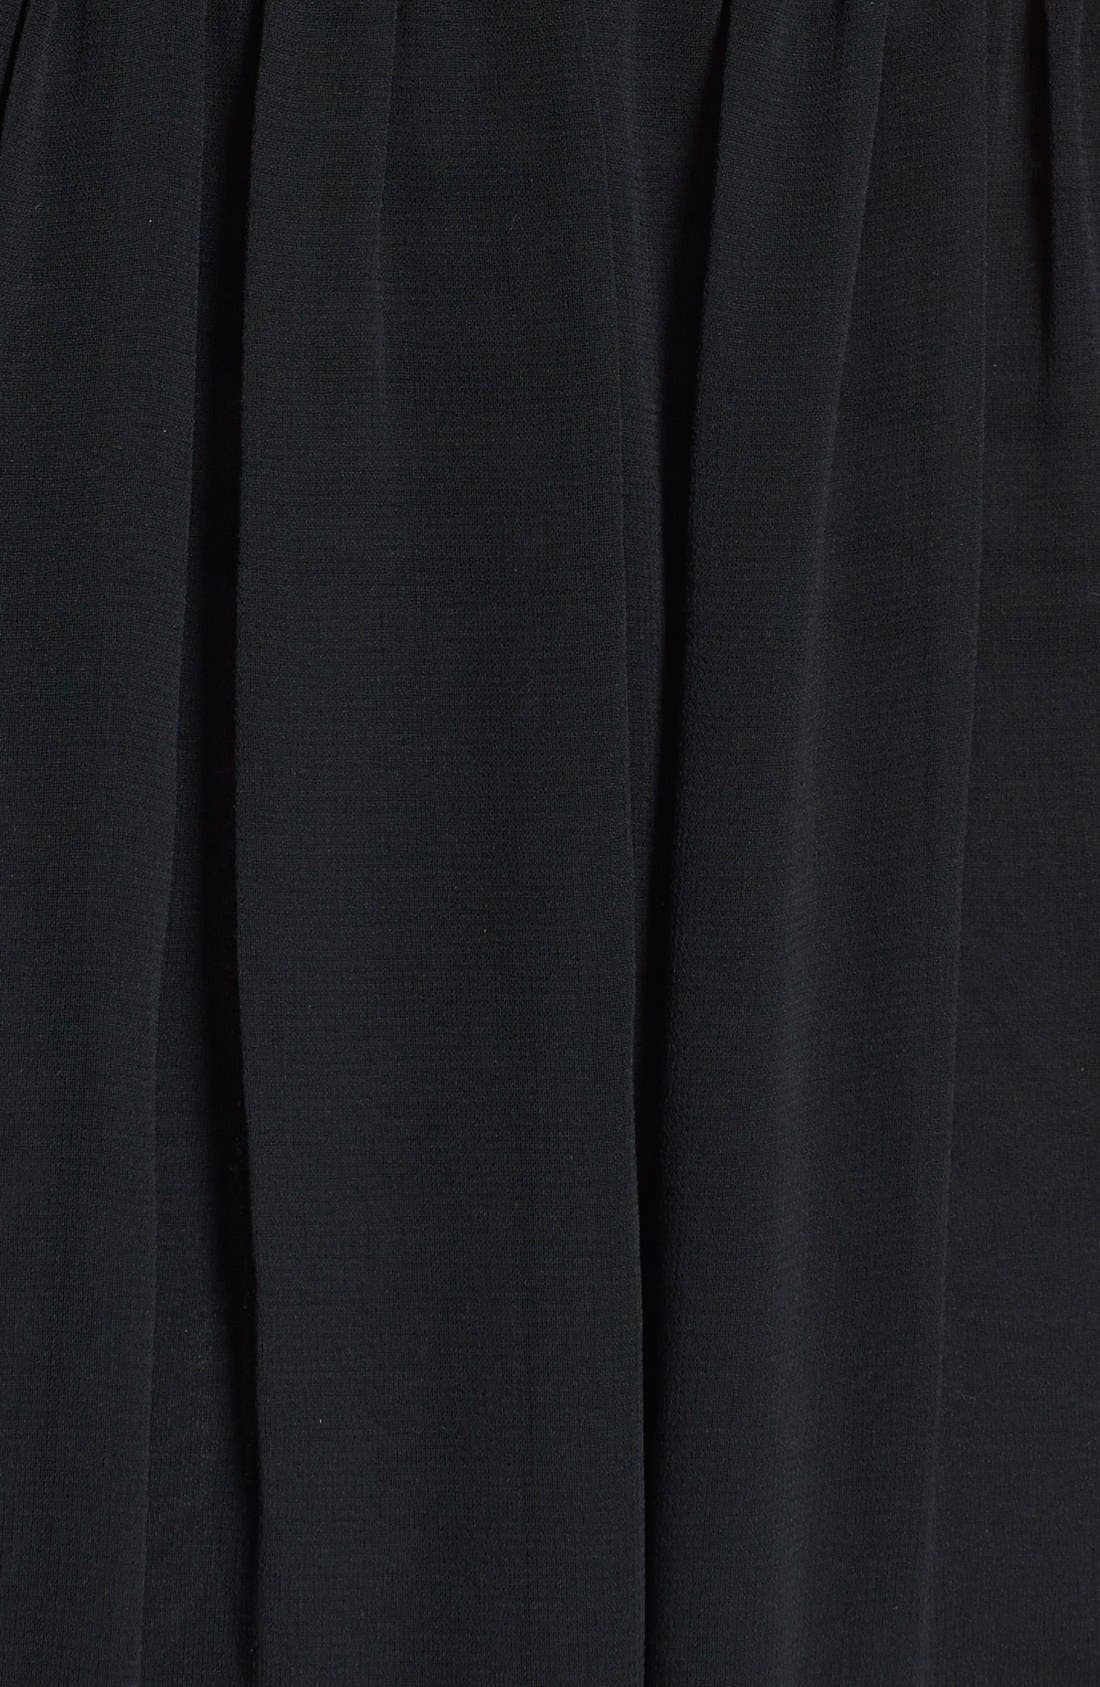 Alternate Image 3  - Felicity & Coco Chiffon Overlay Sleeveless Jersey Dress (Nordstrom Exclusive)